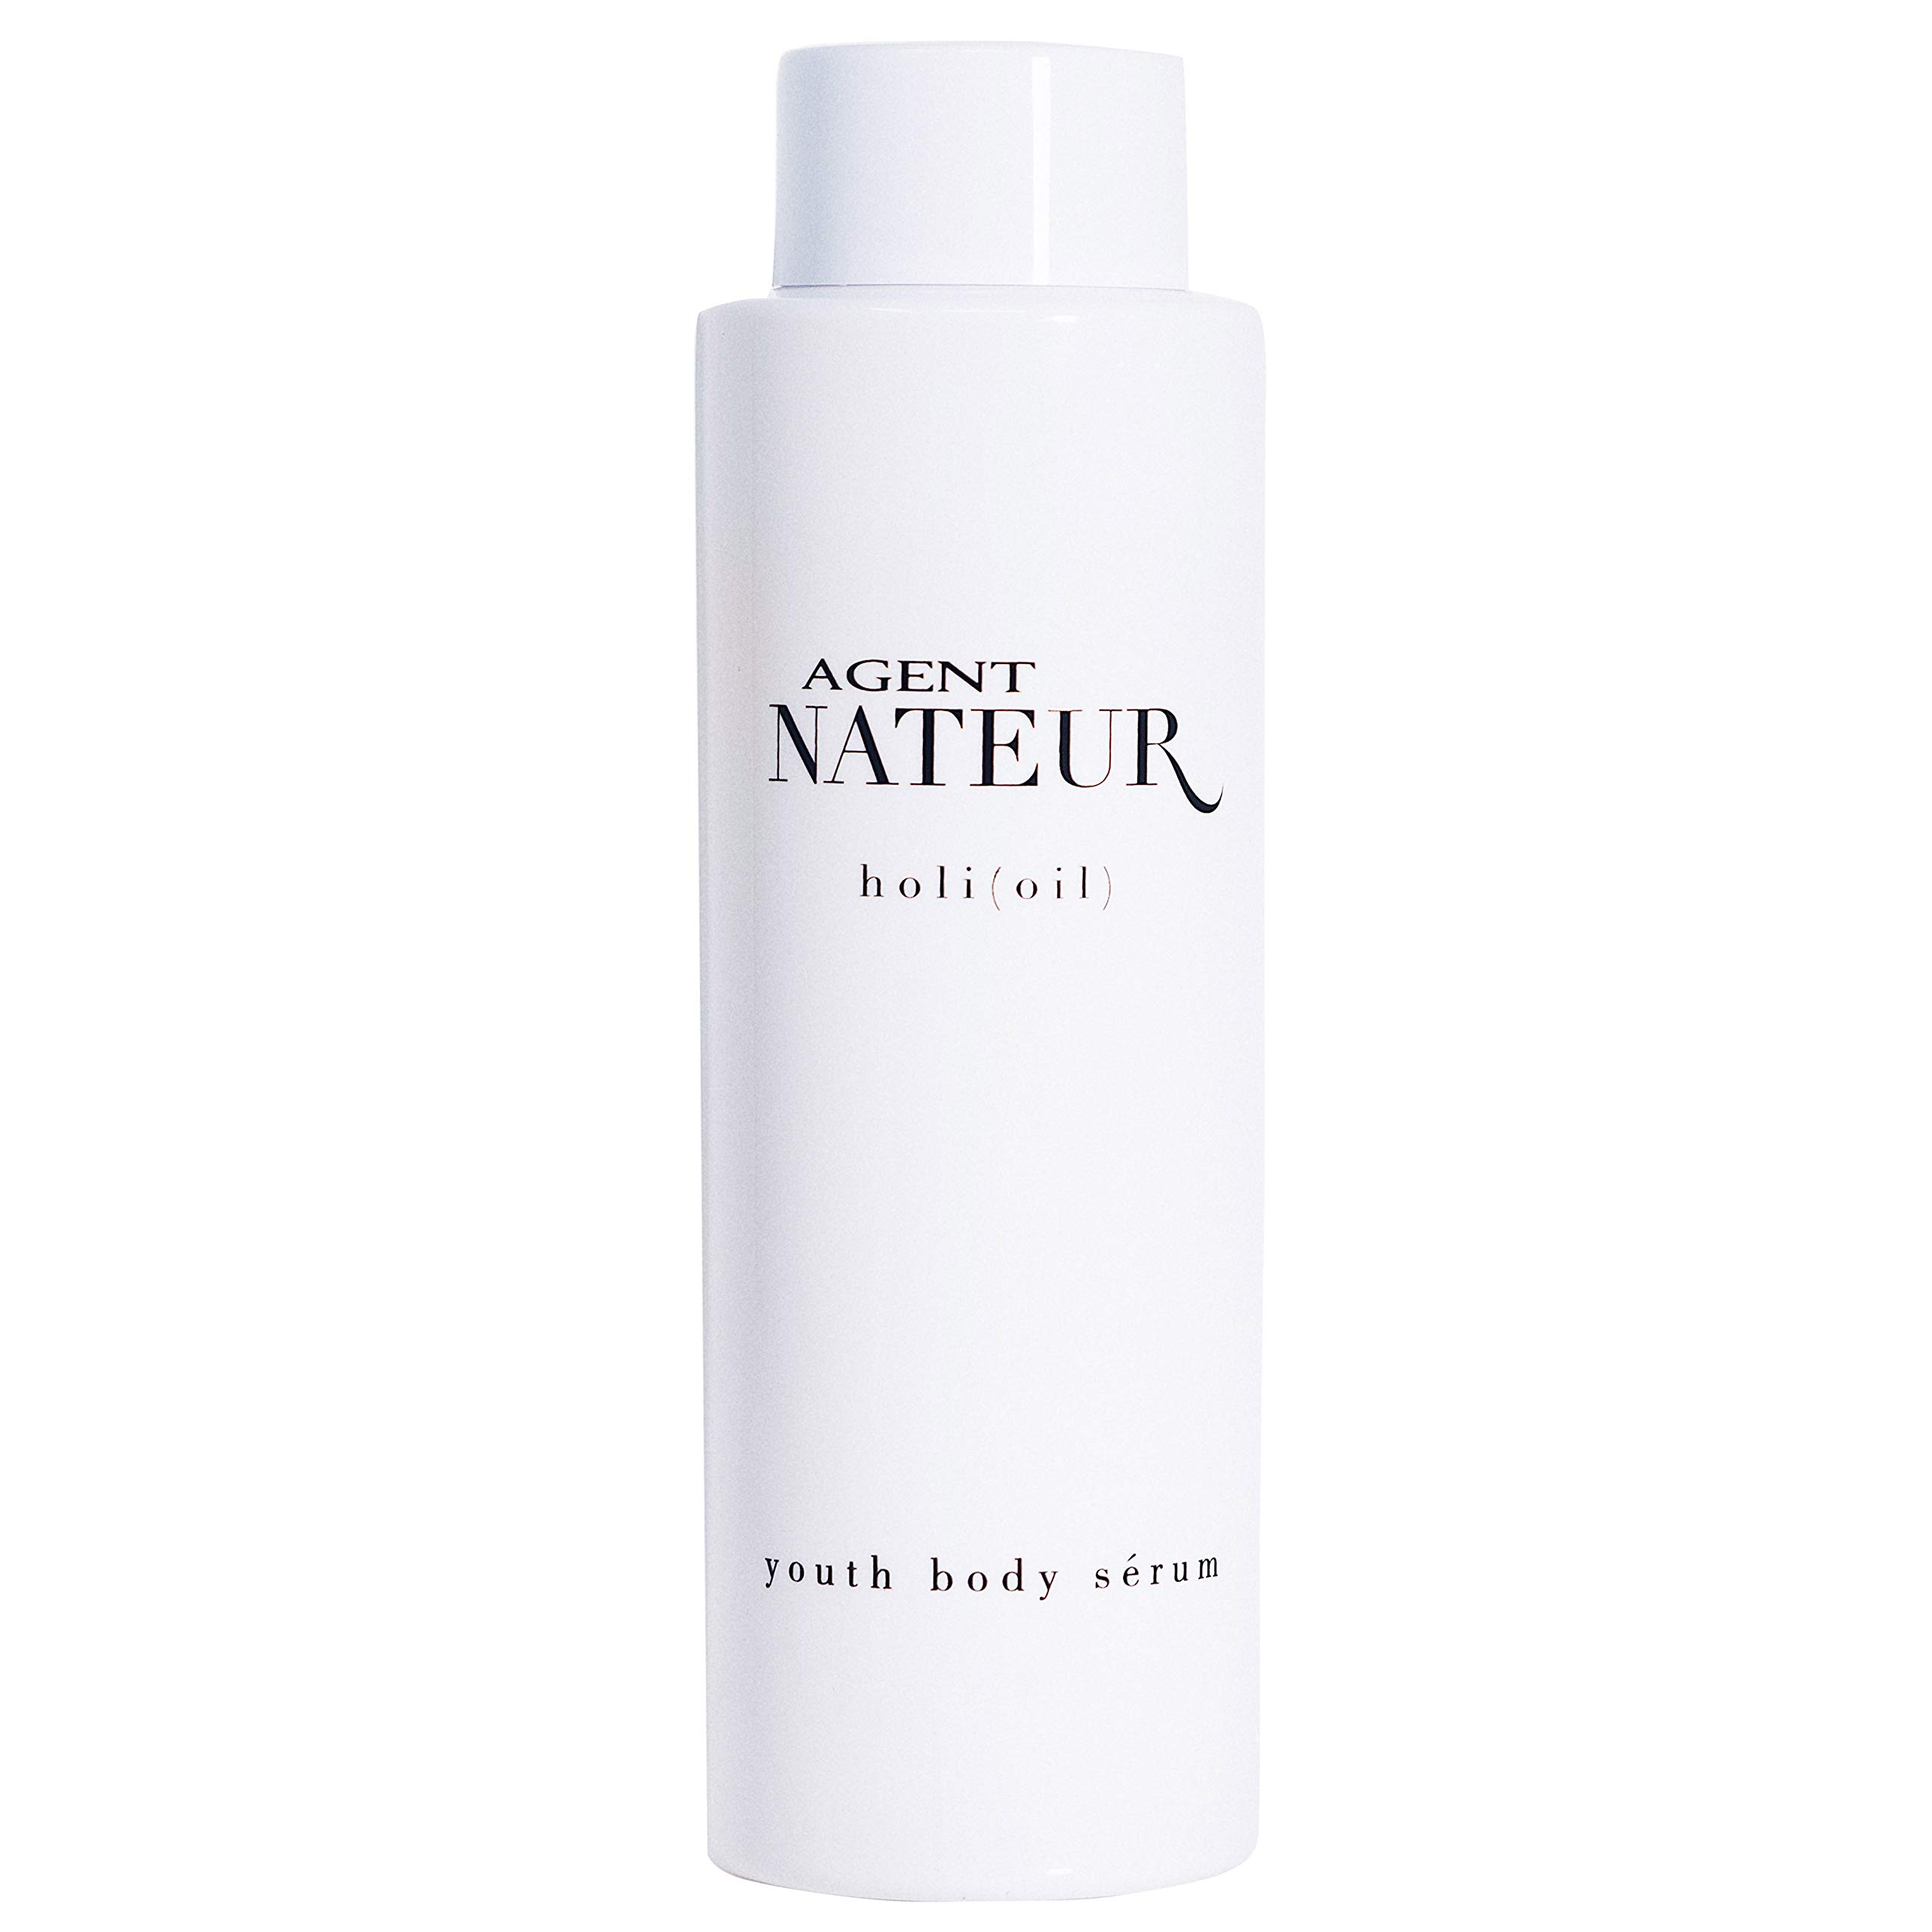 Agent Nateur HOLI (OIL) YOUTH BODY SERUM Anti Cellulite Moisturizer Body Oil for Firm Skin 250ml